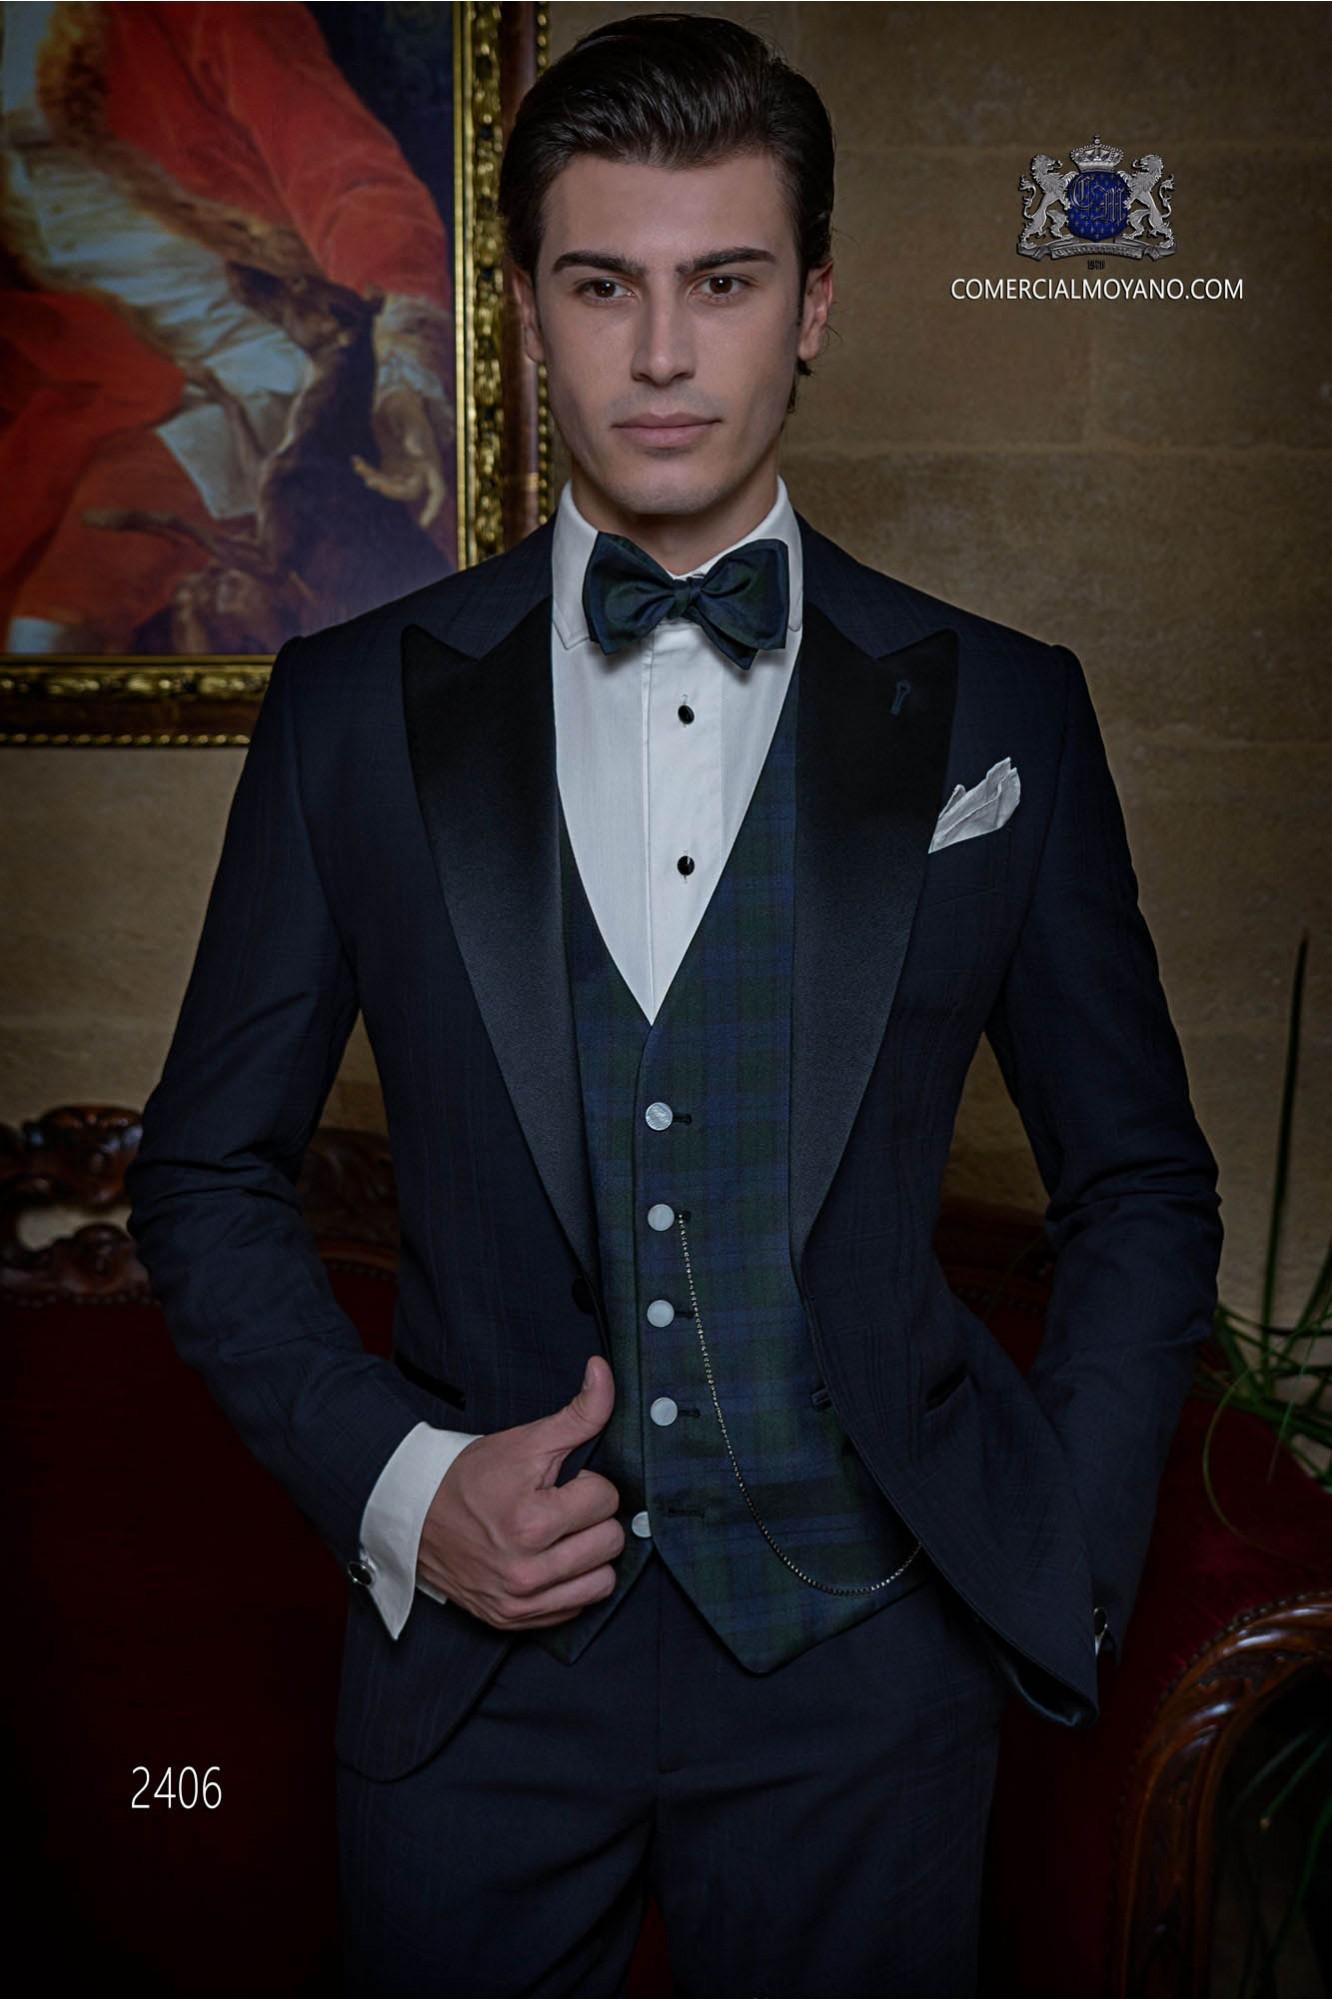 Italian bespoke black breasted tuxedo model 2406 Ottavio Nuccio Gala